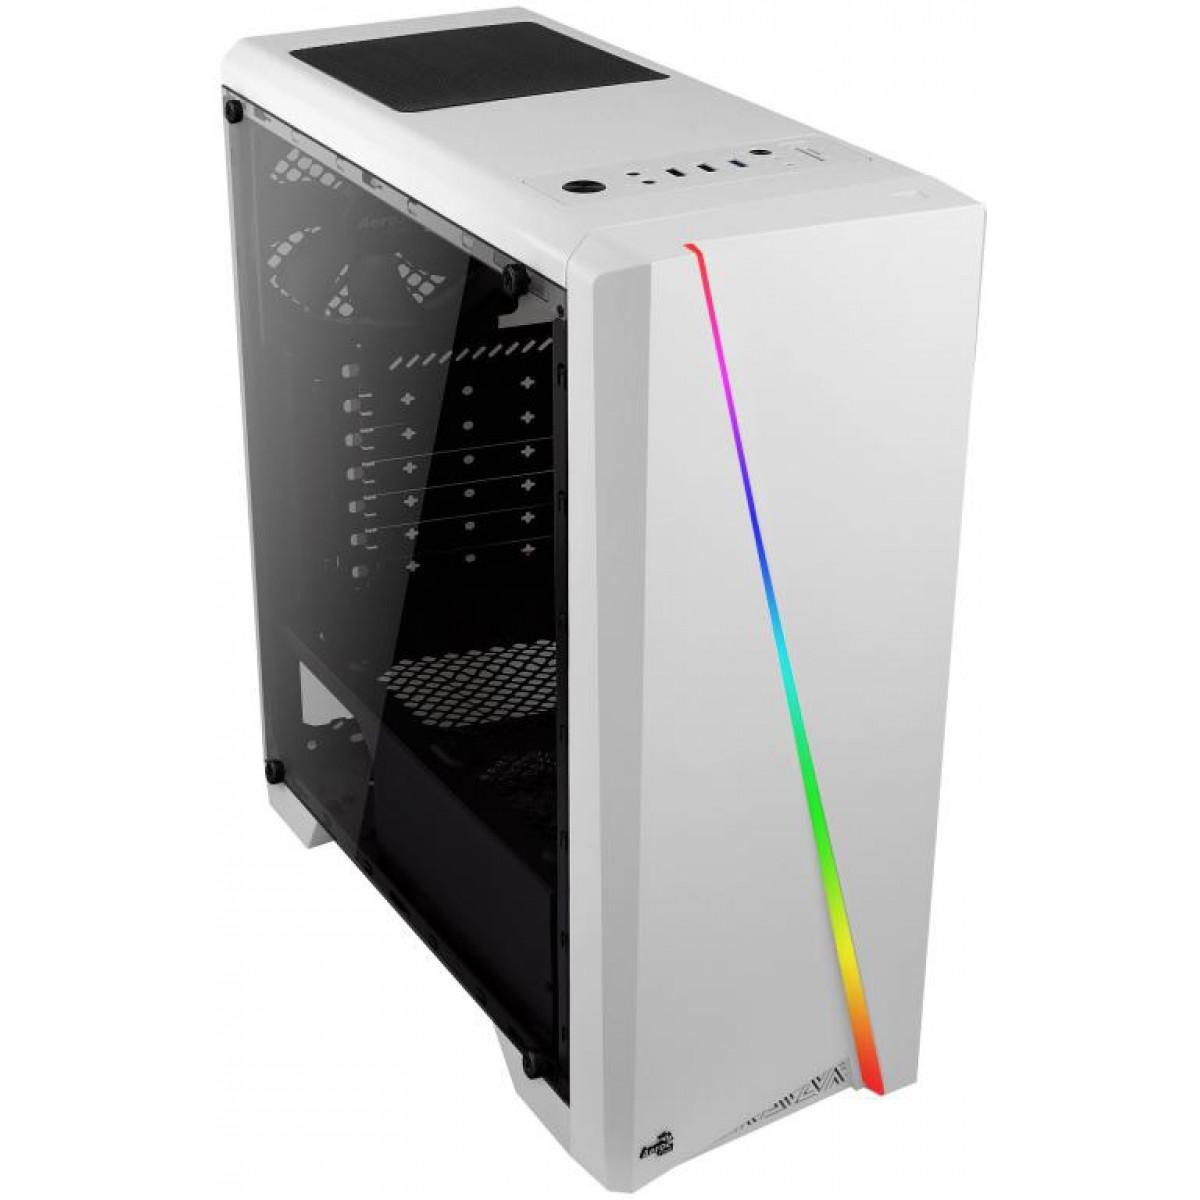 Gabinete Gamer Aerocool, Cylon RGB, Mid Tower, Acrílico, White, Sem Fonte, Com 1 Fan